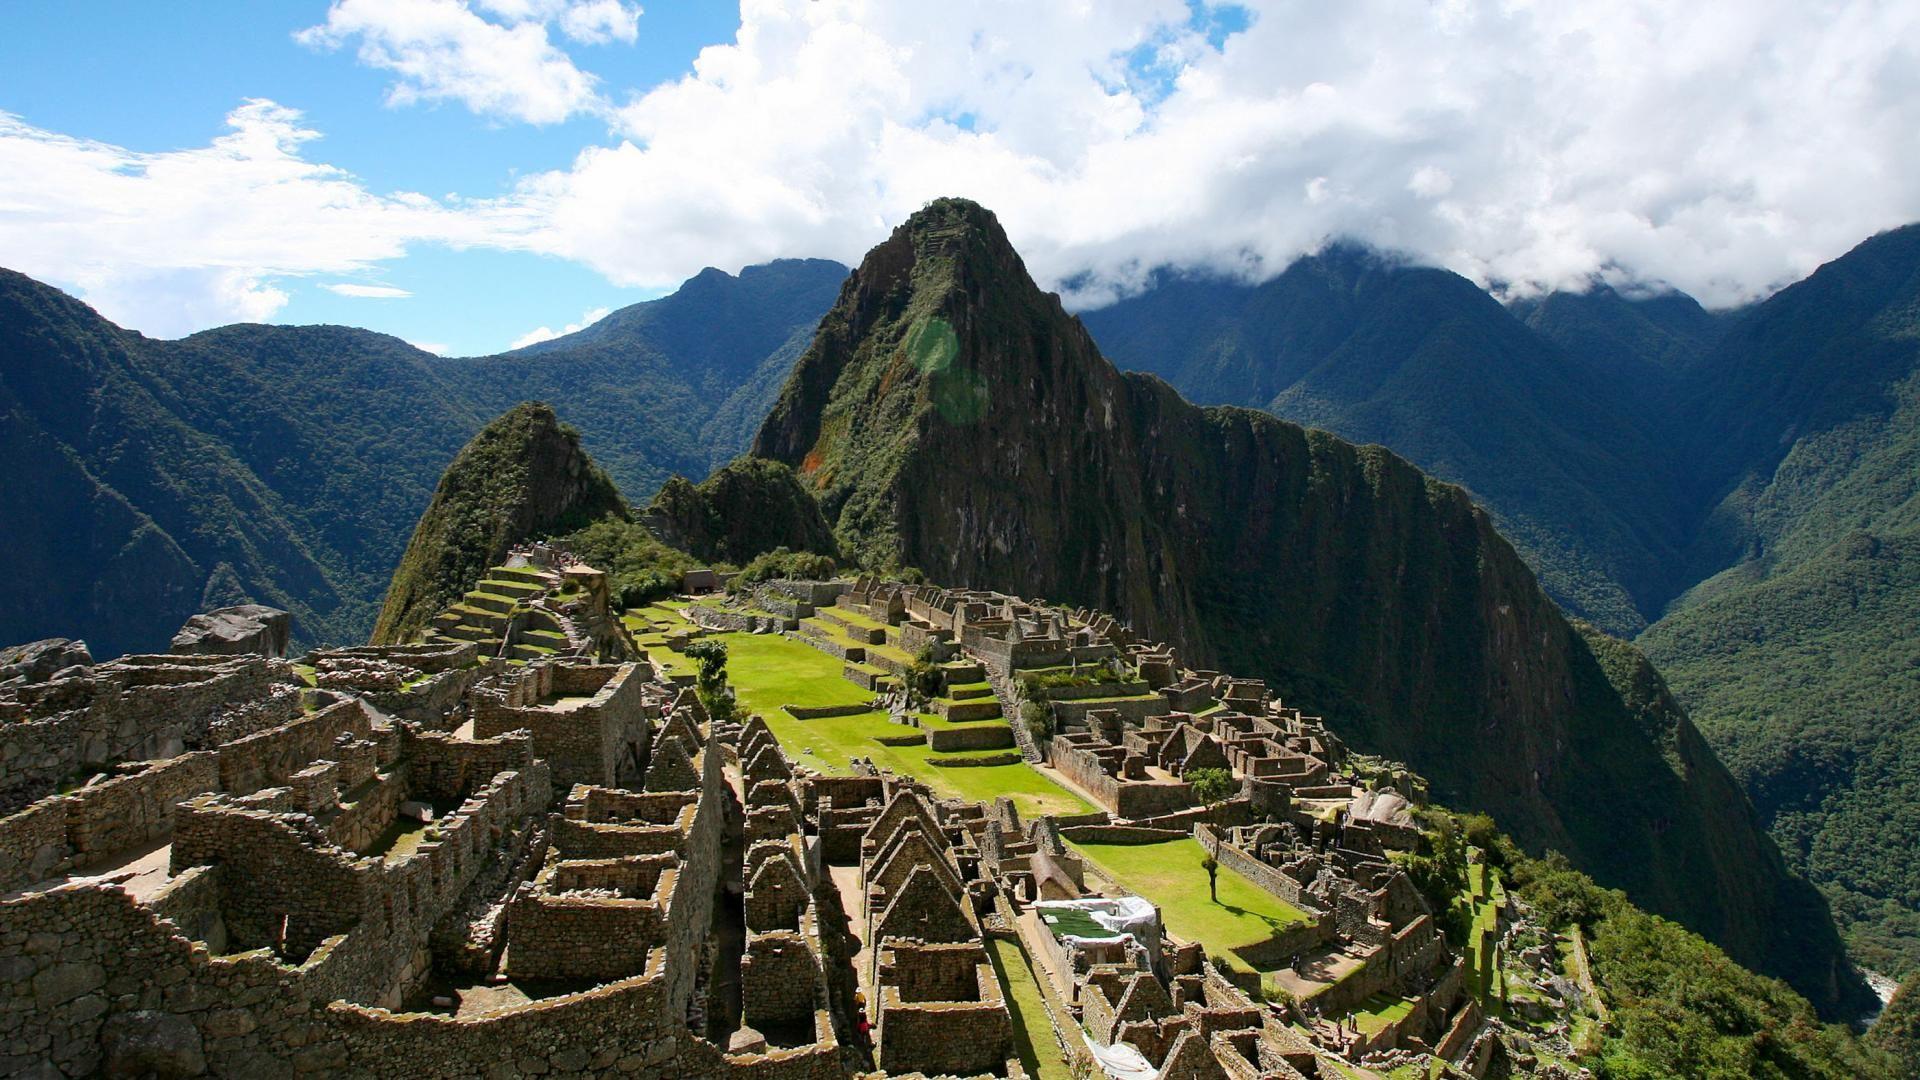 Machu Picchu Peru Machu Picchu Peru Picchu Machu Picchu